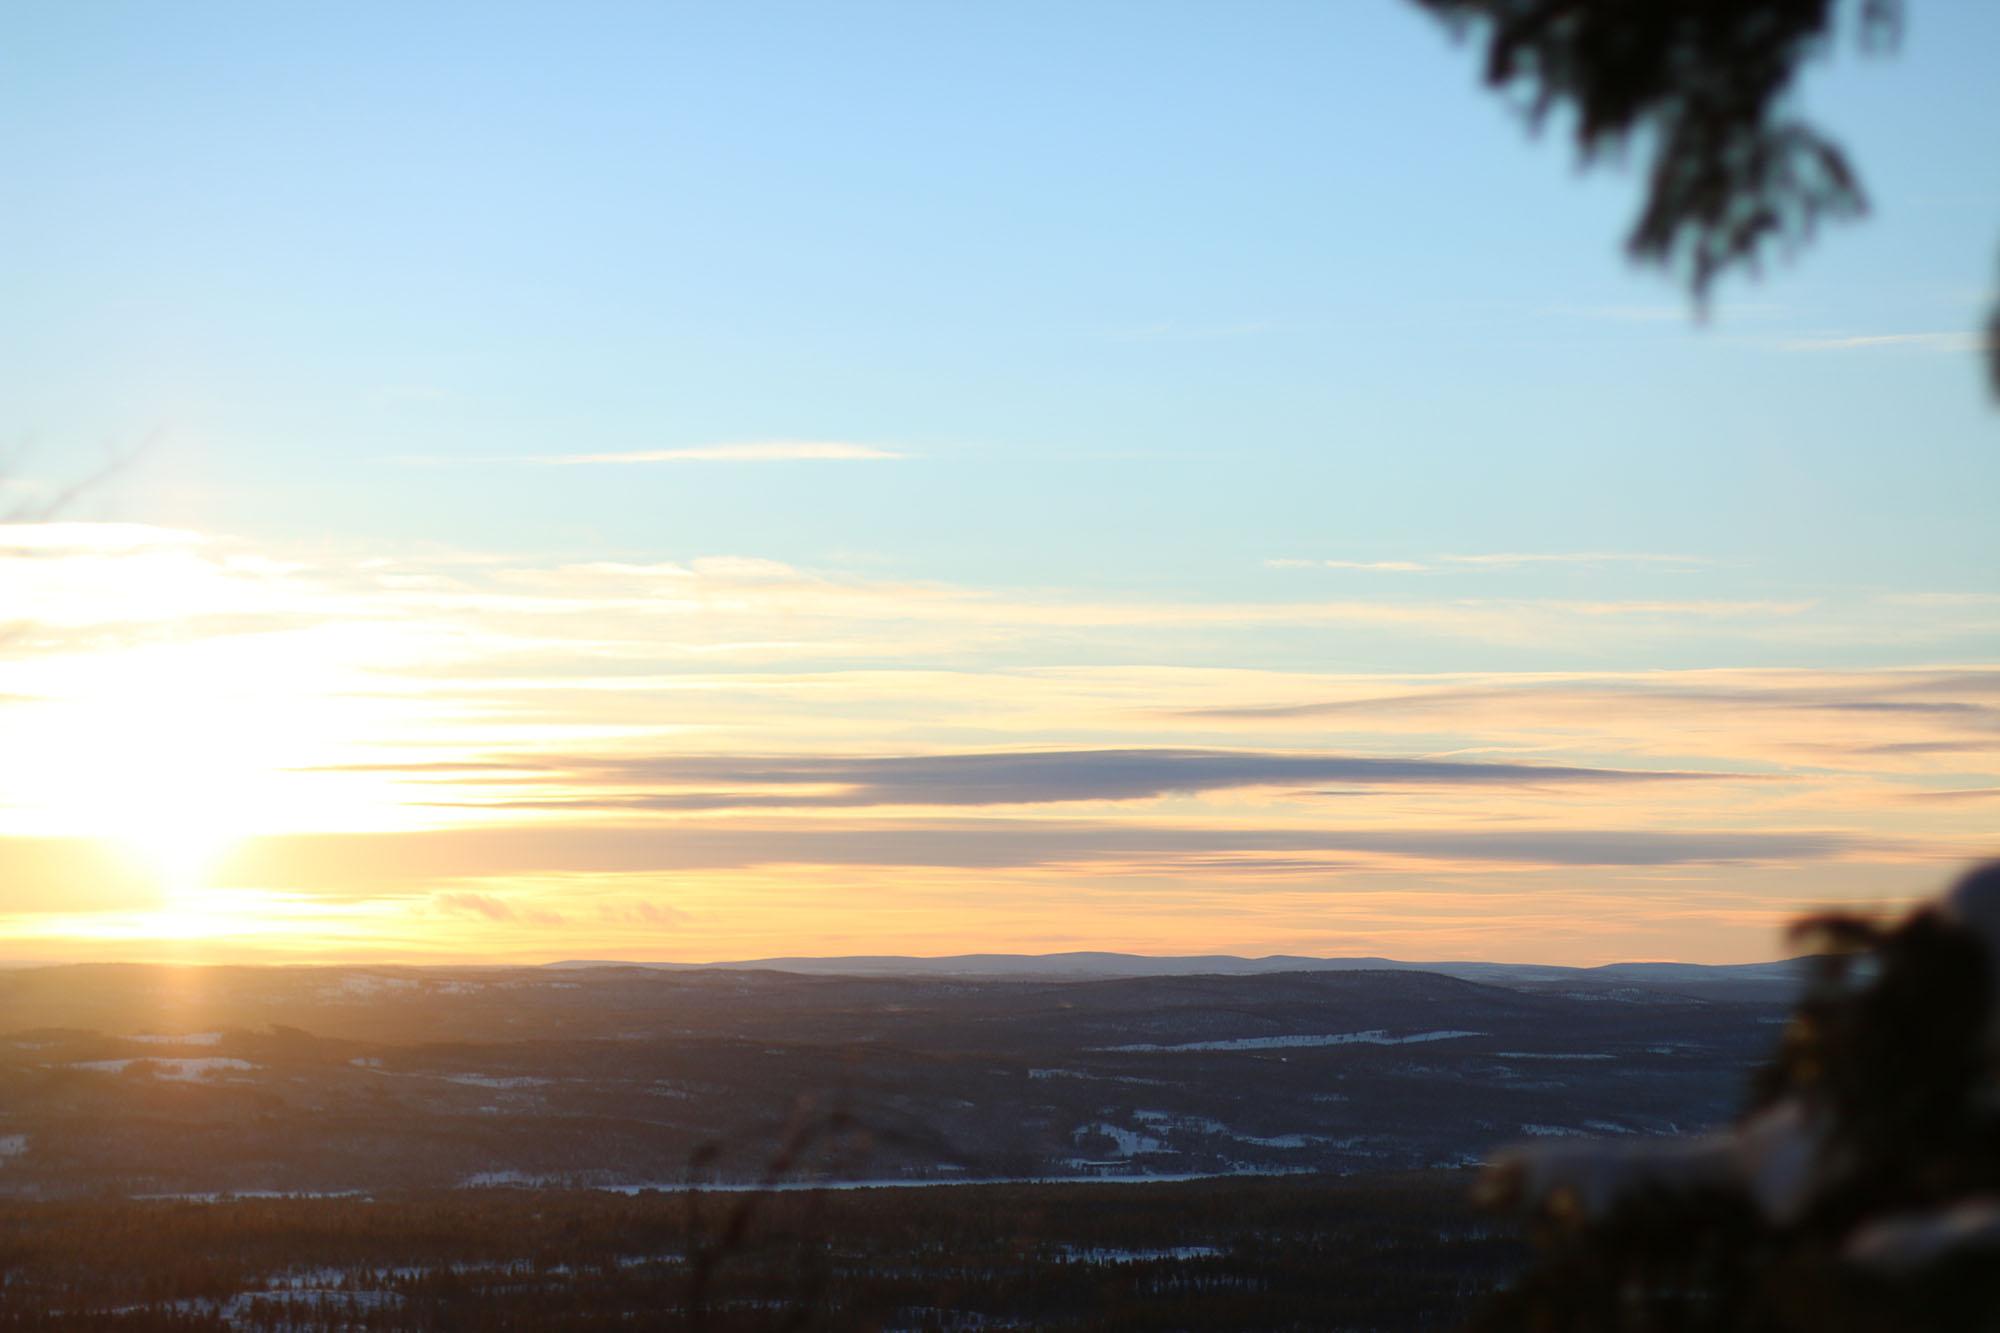 IMG_0515 idre utsikt solnedgång x